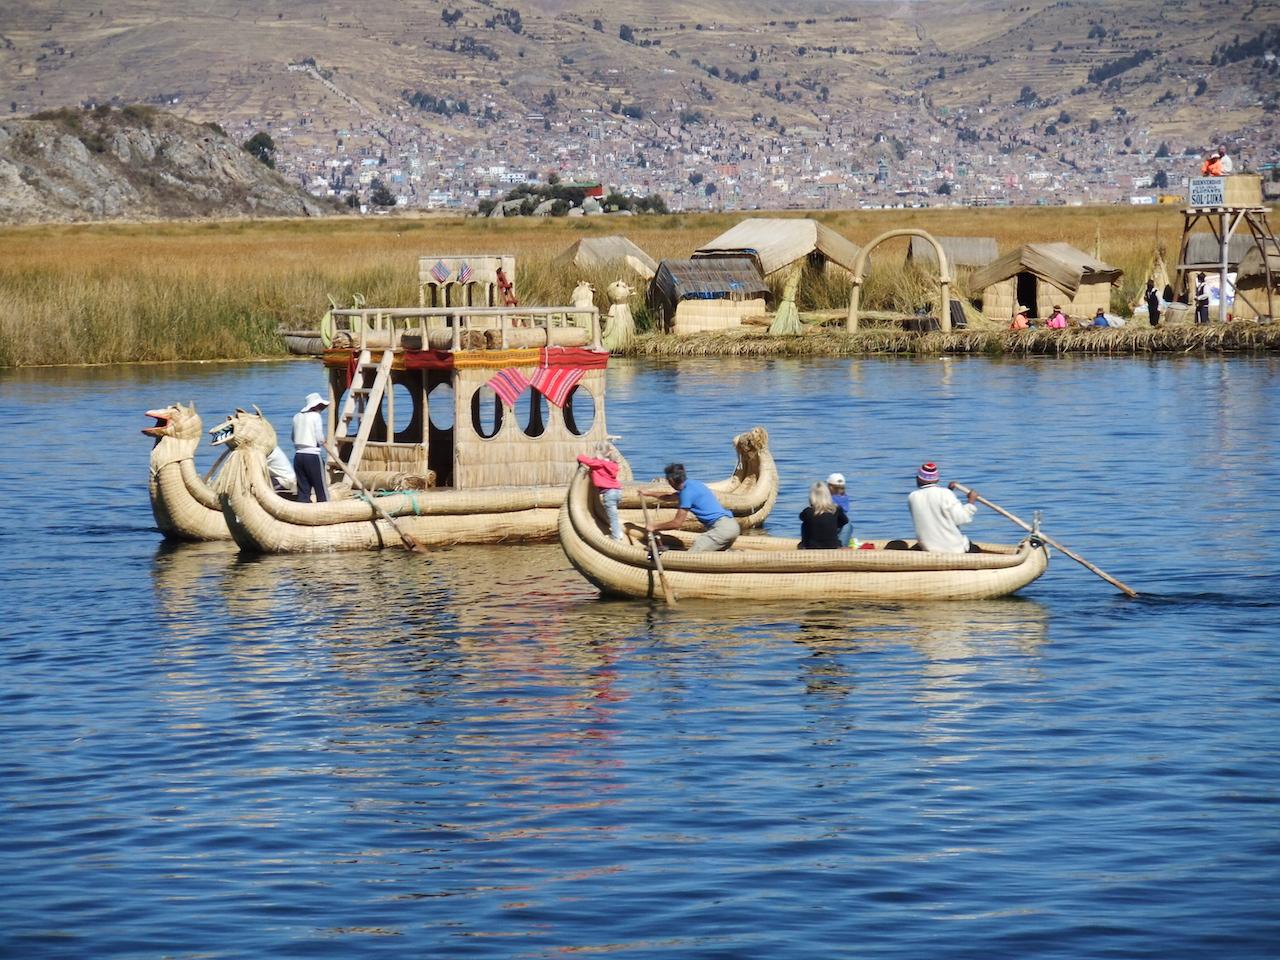 24 juli 2011 Puno – La Paz (3600m)